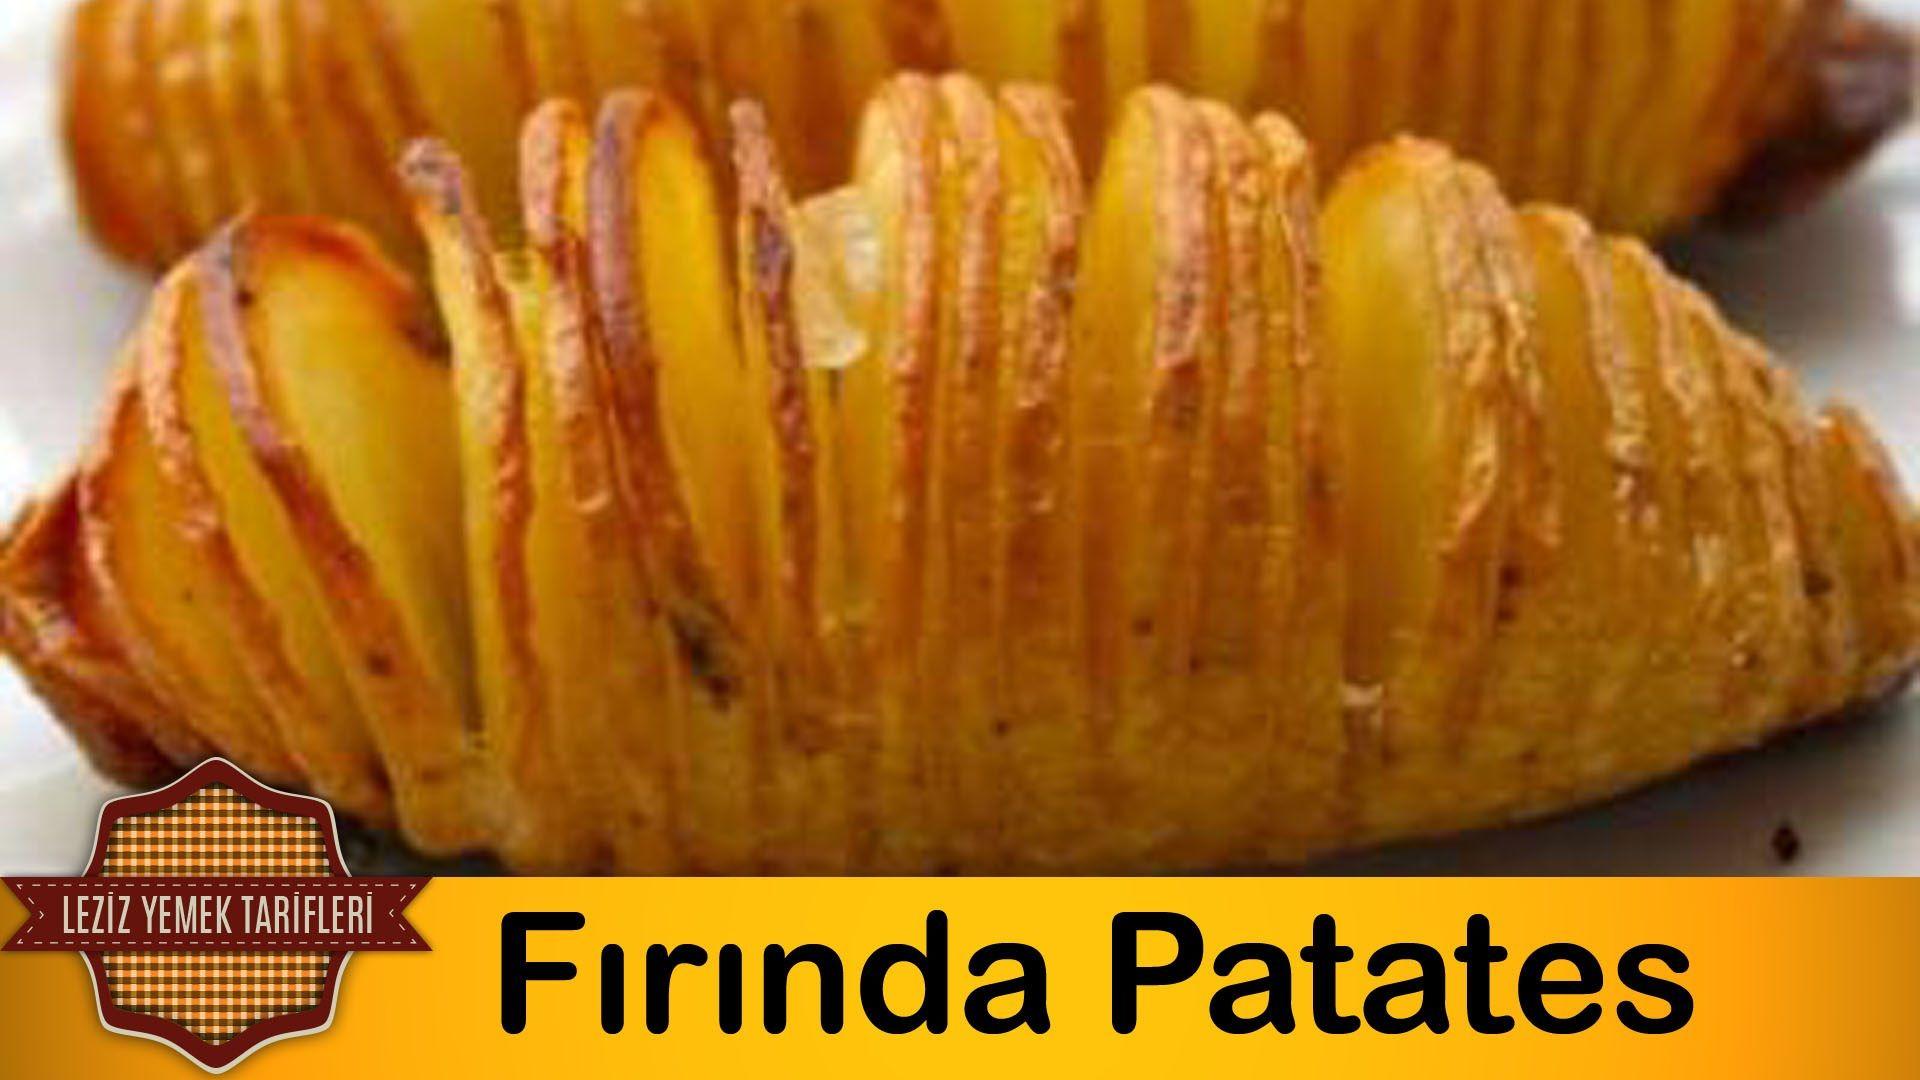 Fırında Patates Kızartması Videosu